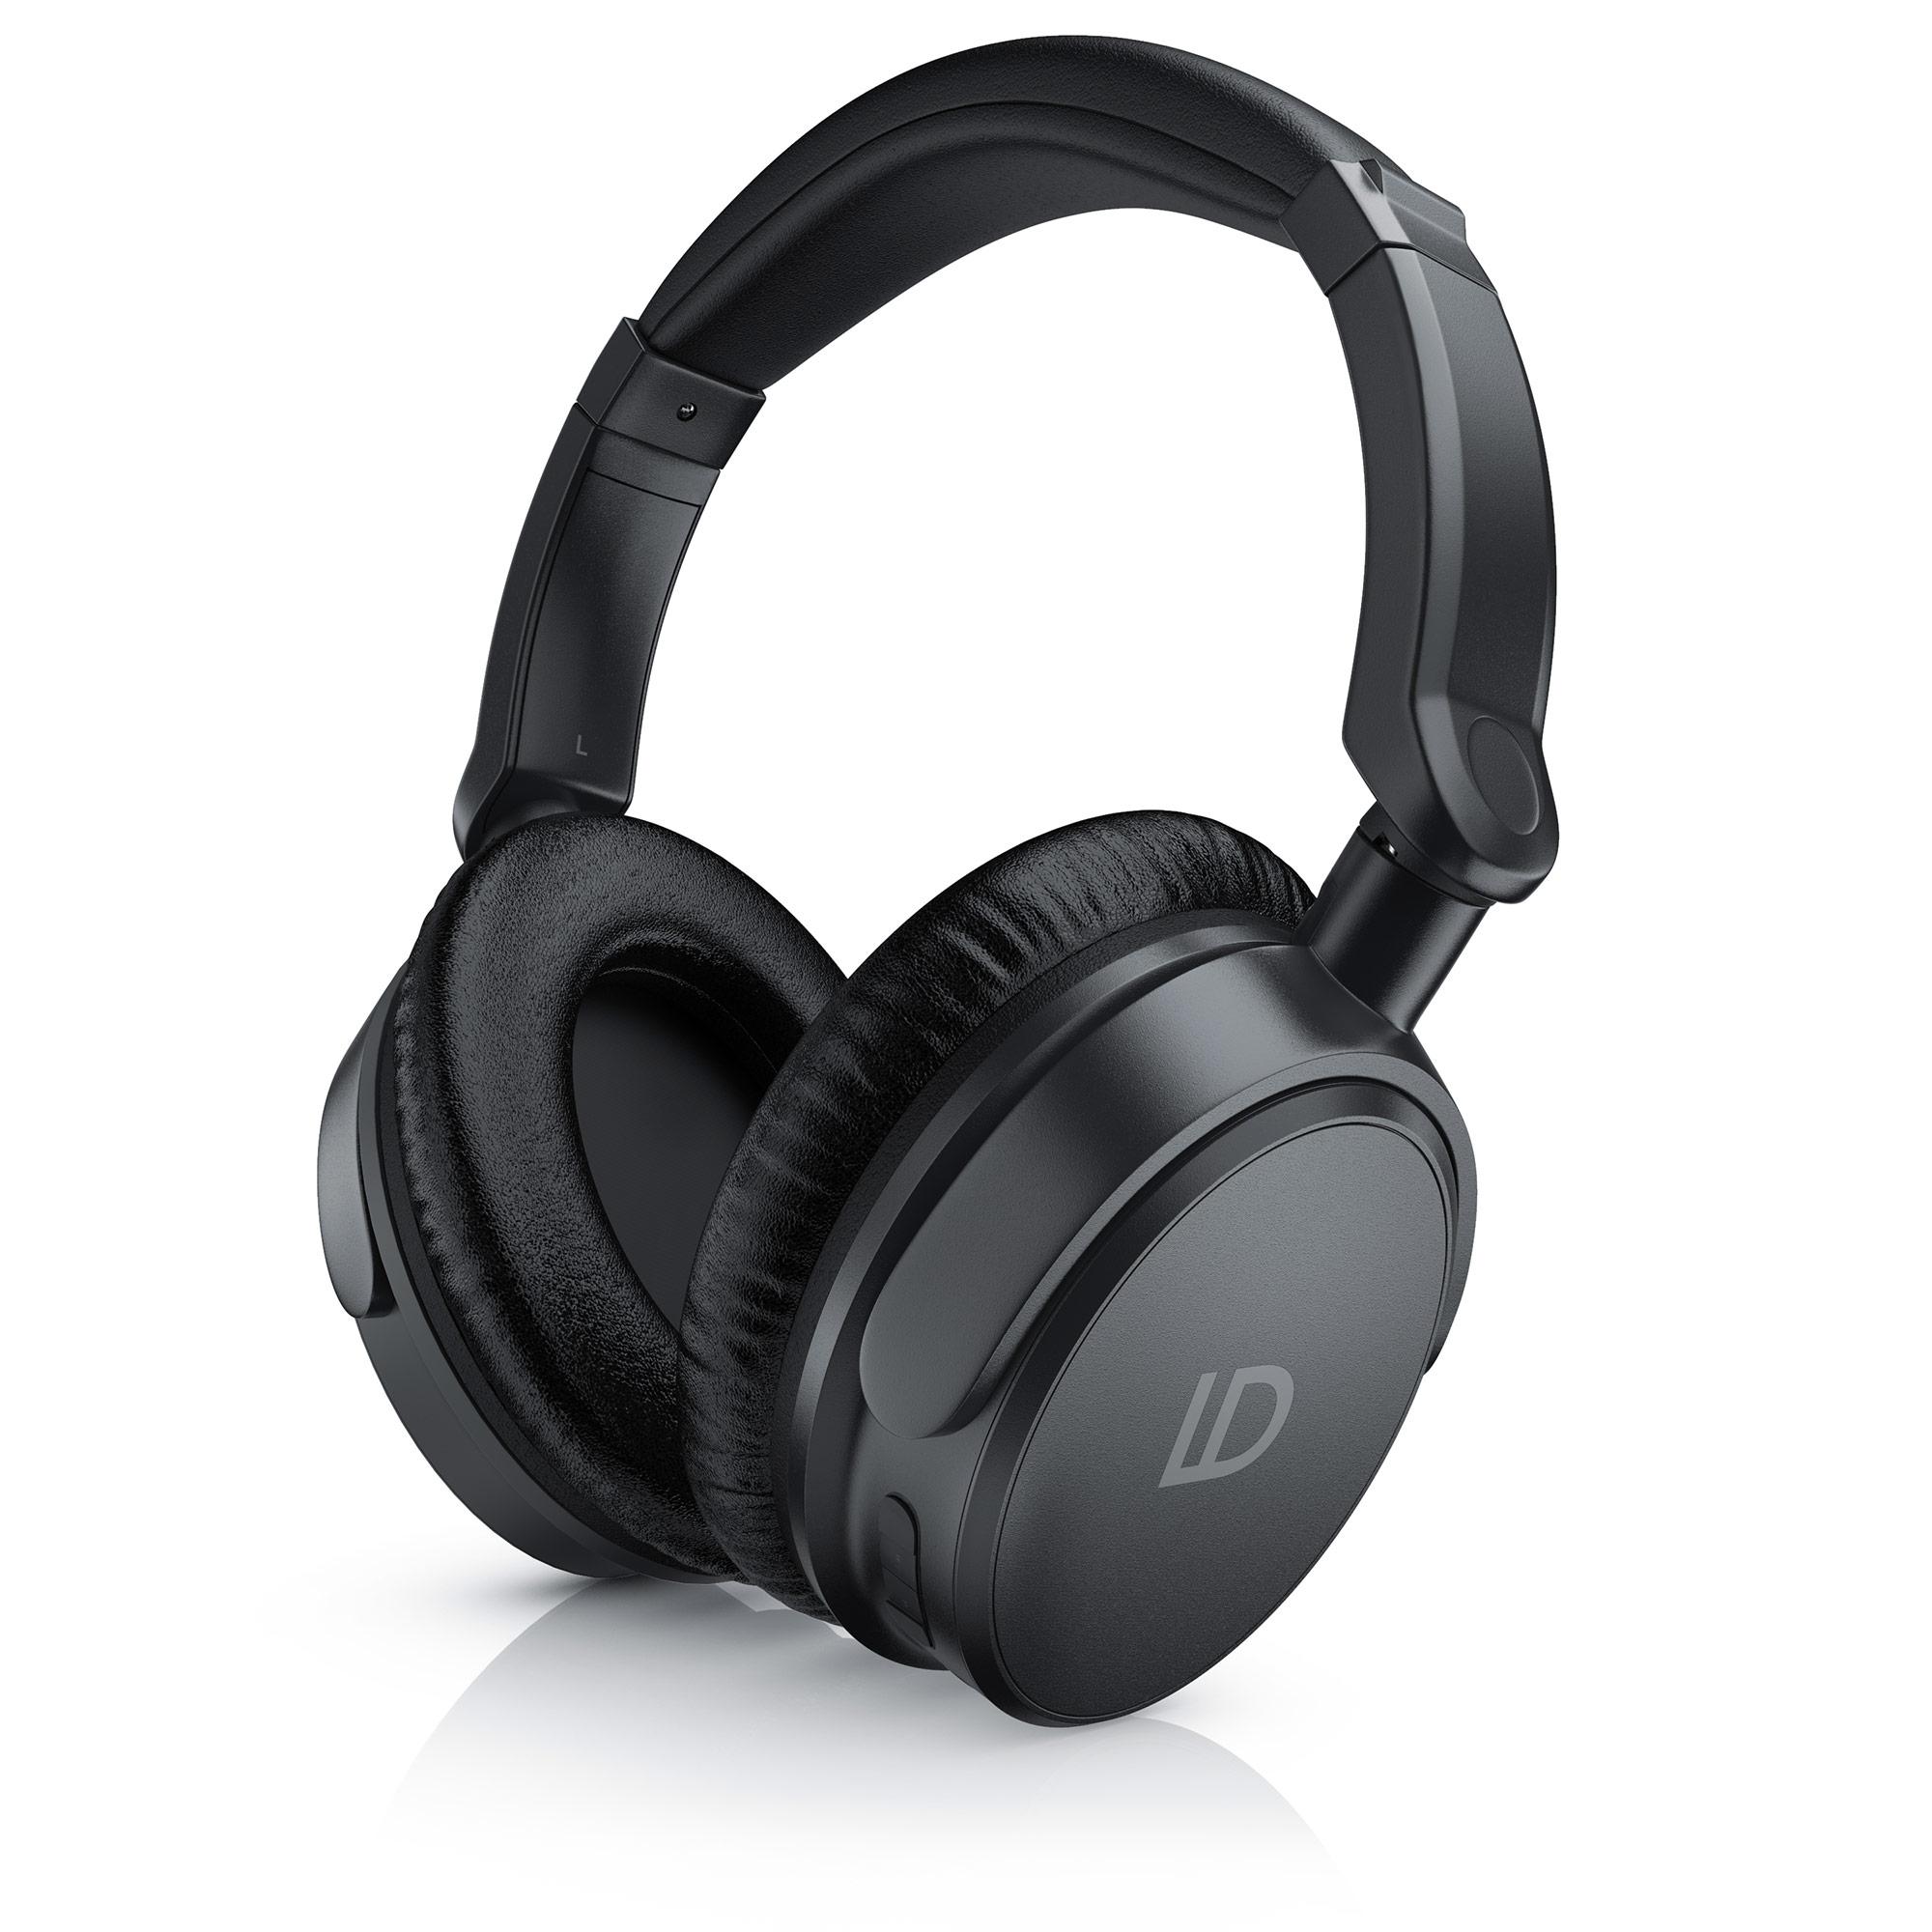 303024--LD-overear-headphones-galerie.jpg